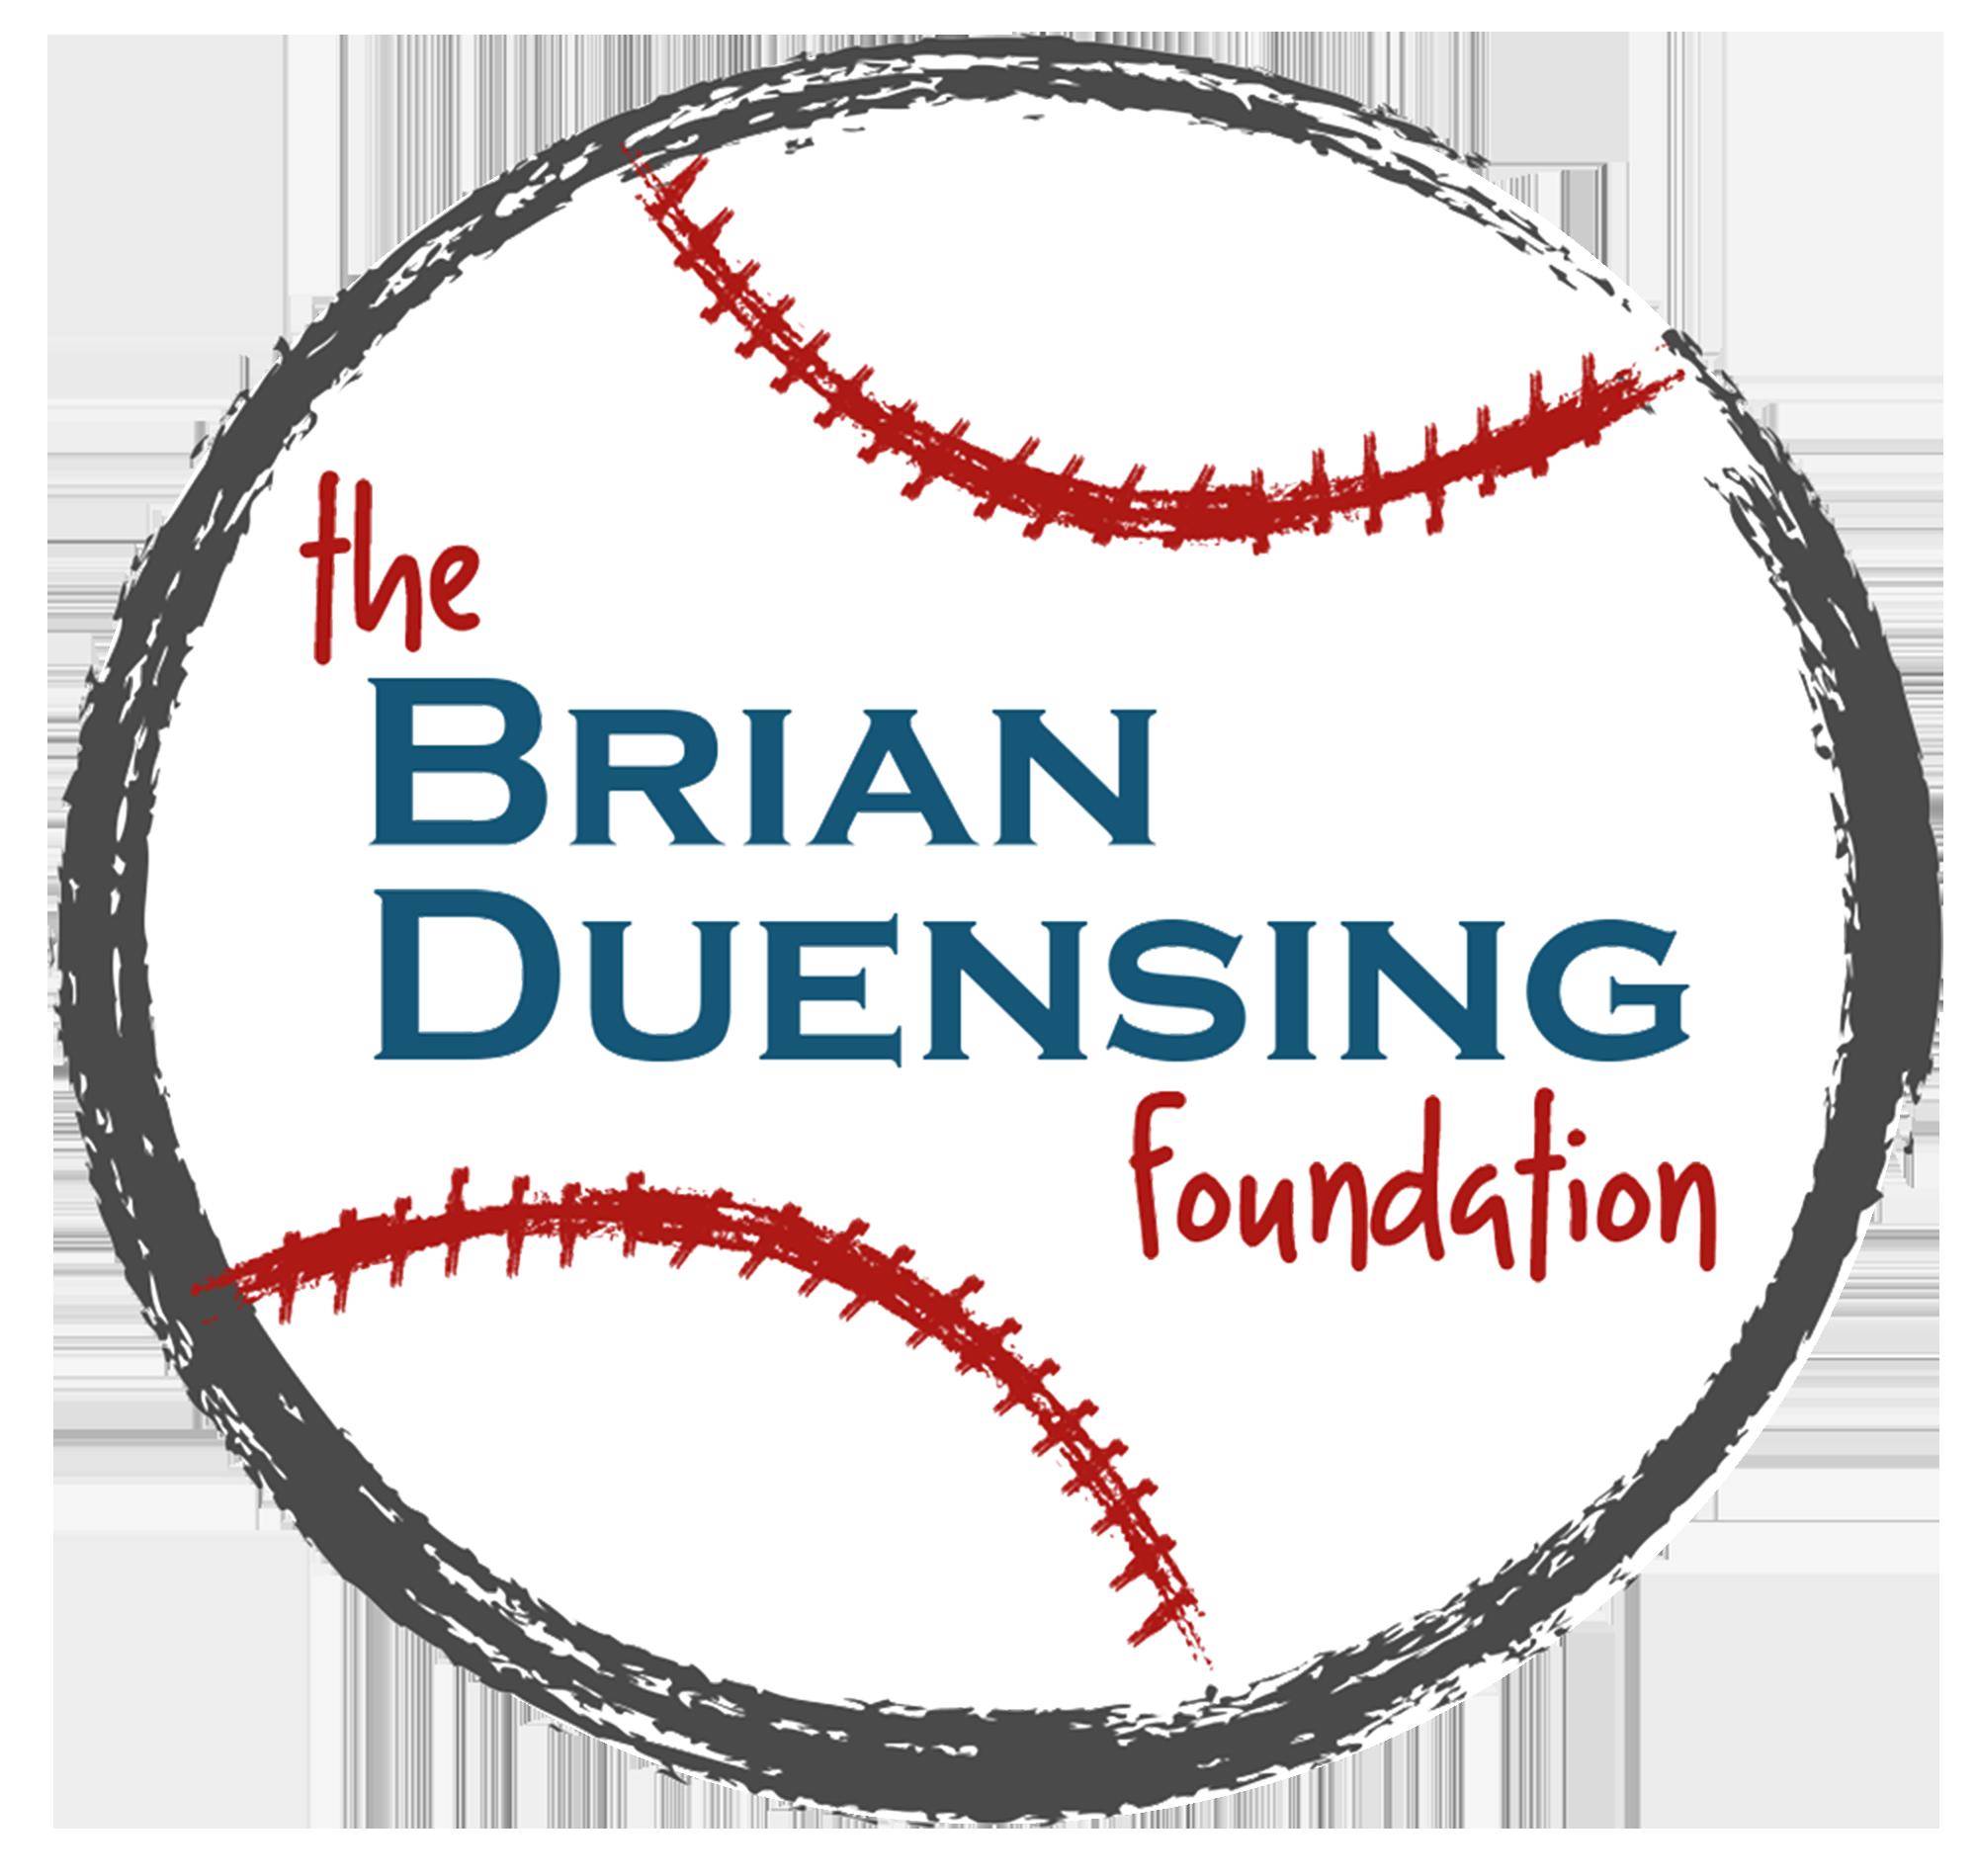 Brian Duensing Foundation